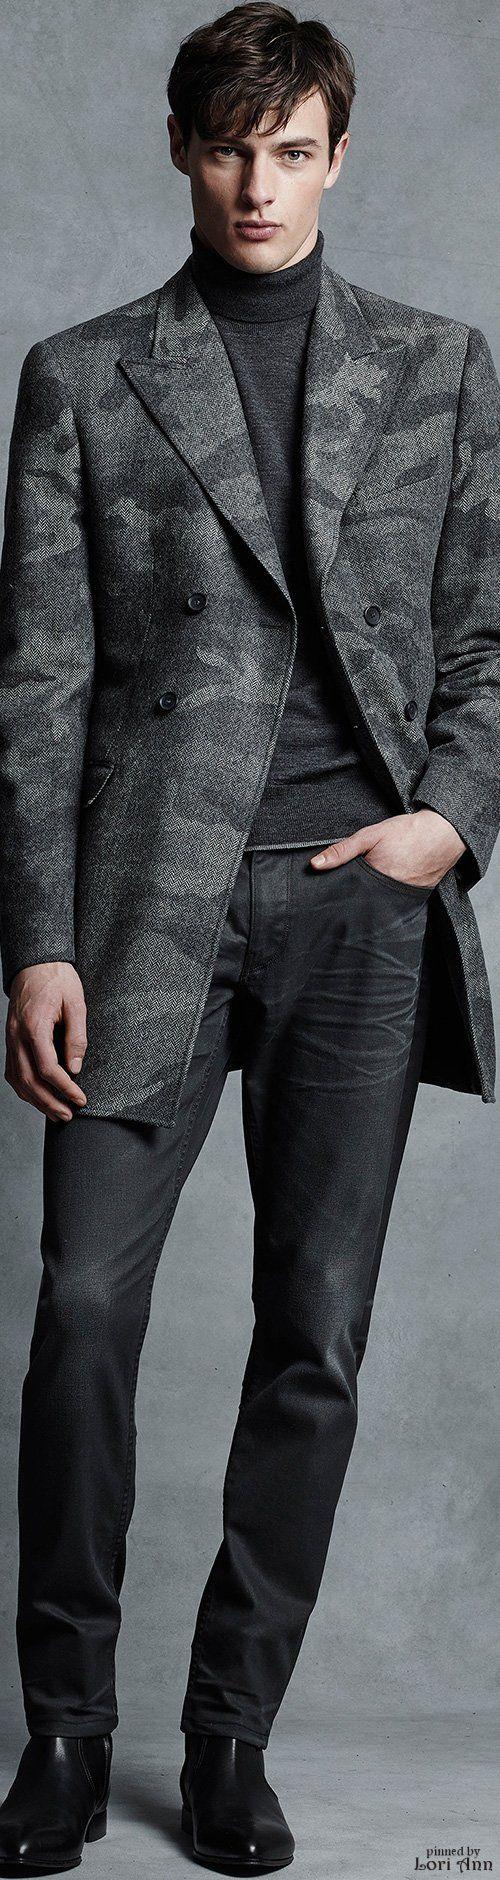 Michael Kors Fall 2015   Menswear   Men's Fashion   Smart Casual   Men's Gray Outfit   Moda Masculina   Shop at designerclothingfans.com